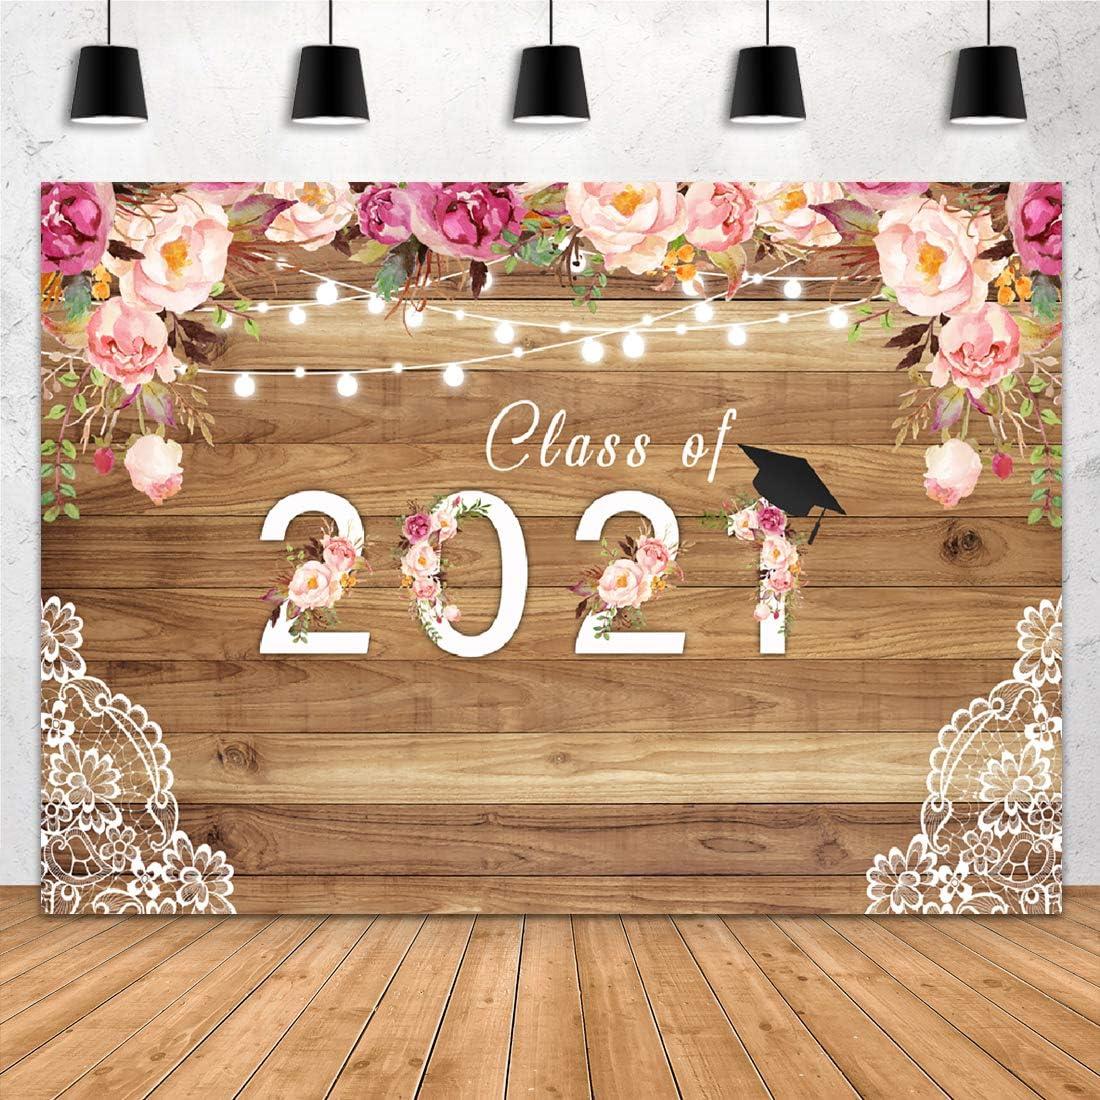 Aperturee Class of 2021 定番から日本未入荷 Seasonal Wrap入荷 Graduation 7x5ft Photography Backdrop Pr